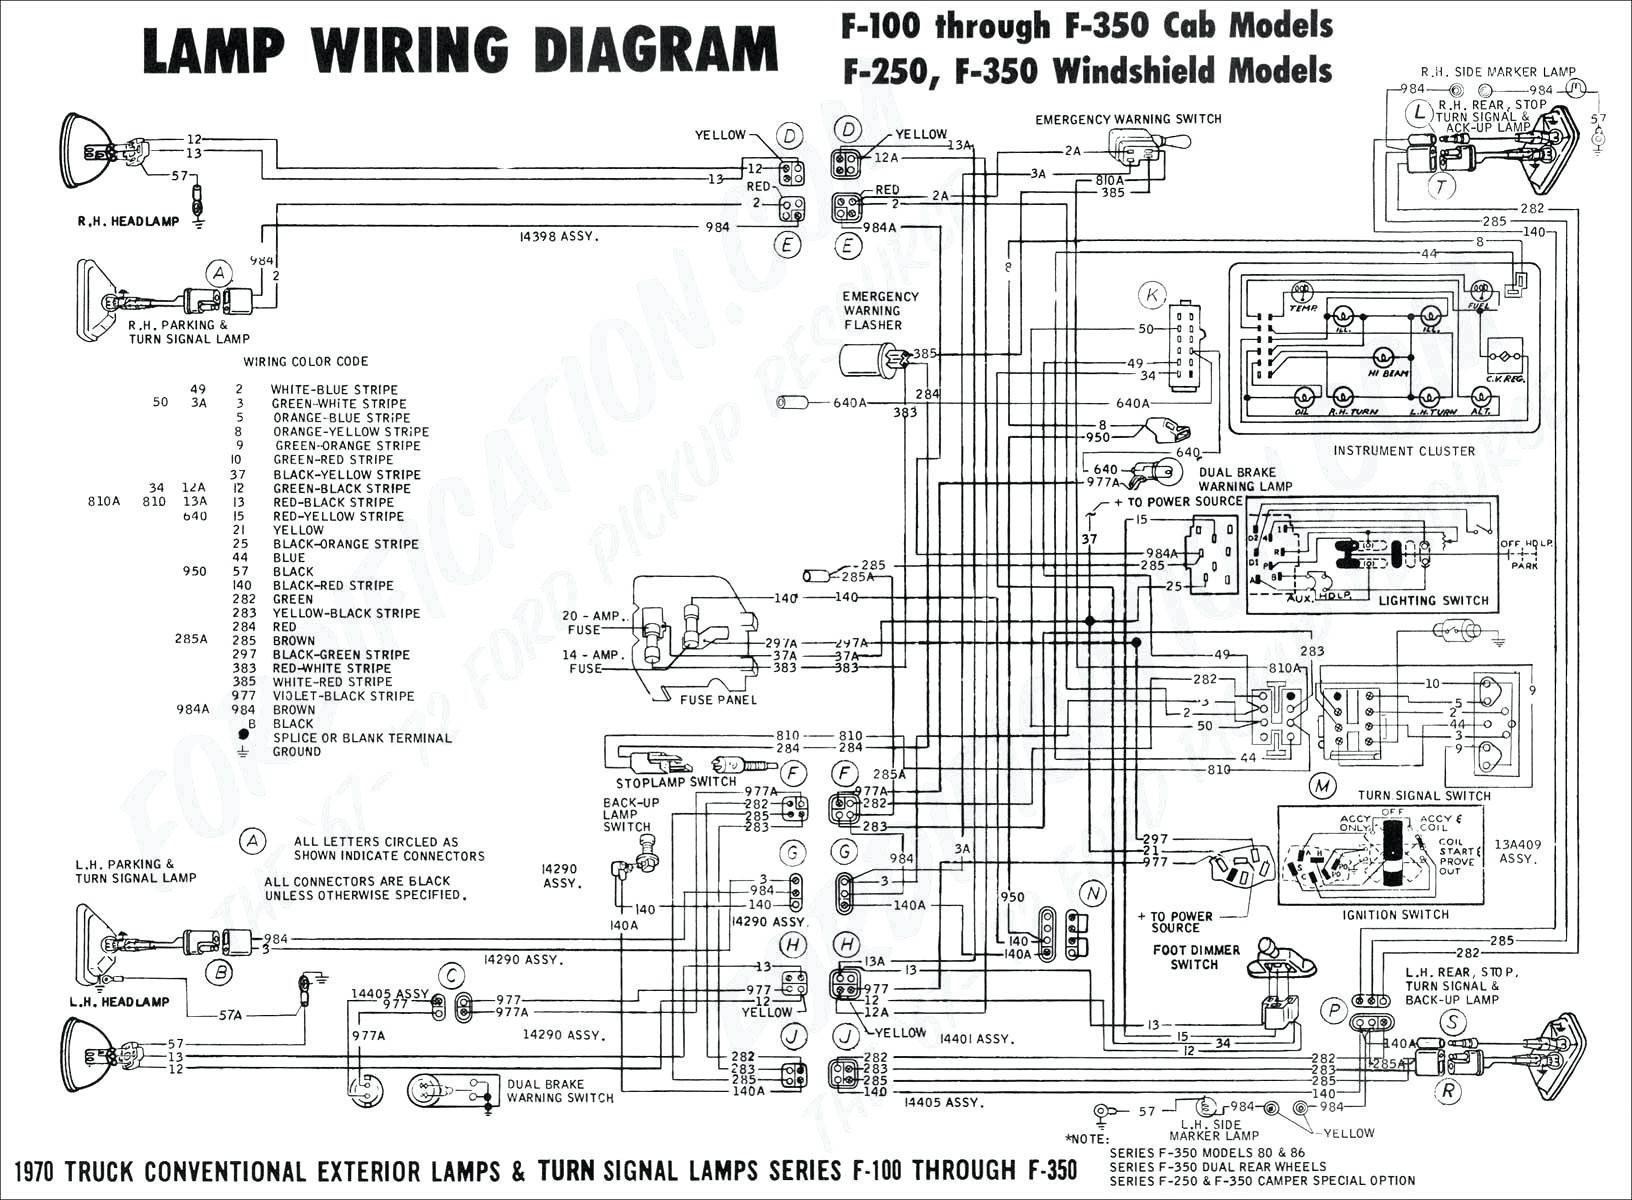 Cummins N14 Engine Diagram 2004 Cummins Wiring Diagram Worksheet and Wiring Diagram • Of Cummins N14 Engine Diagram